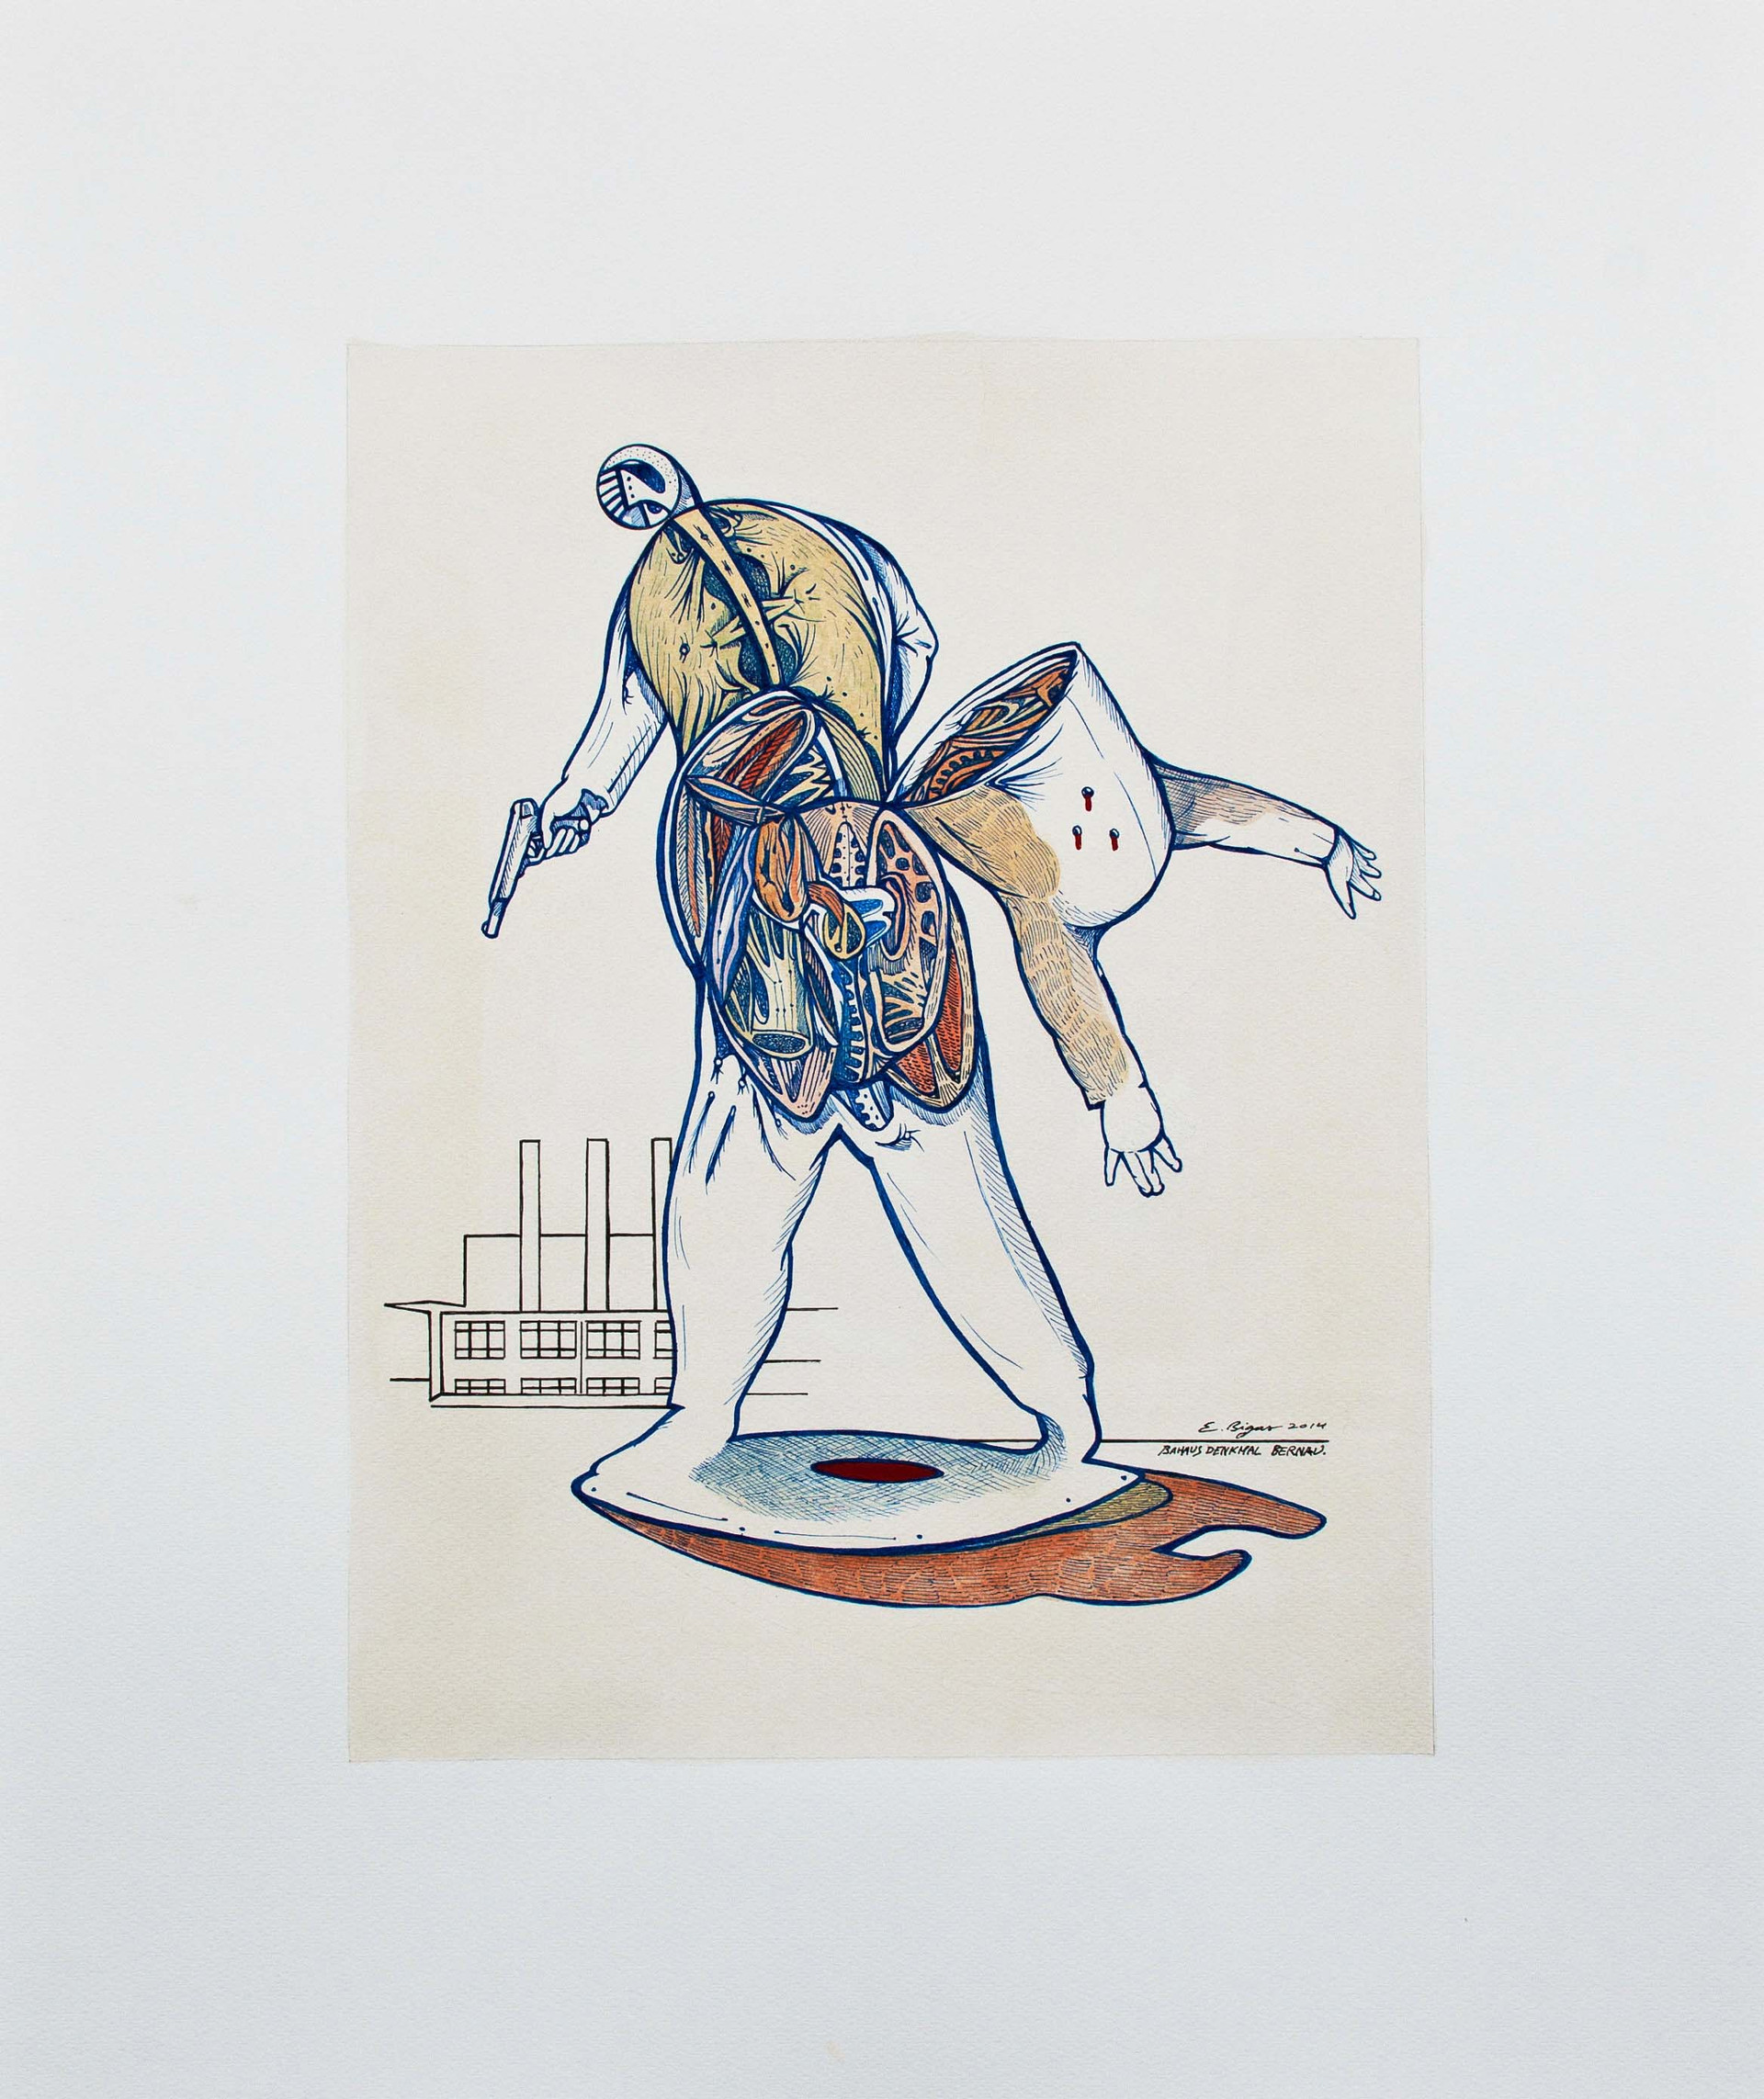 Mortal ut plurimum  2014 60x50cm. Watercolour, gouache and Ink on paper